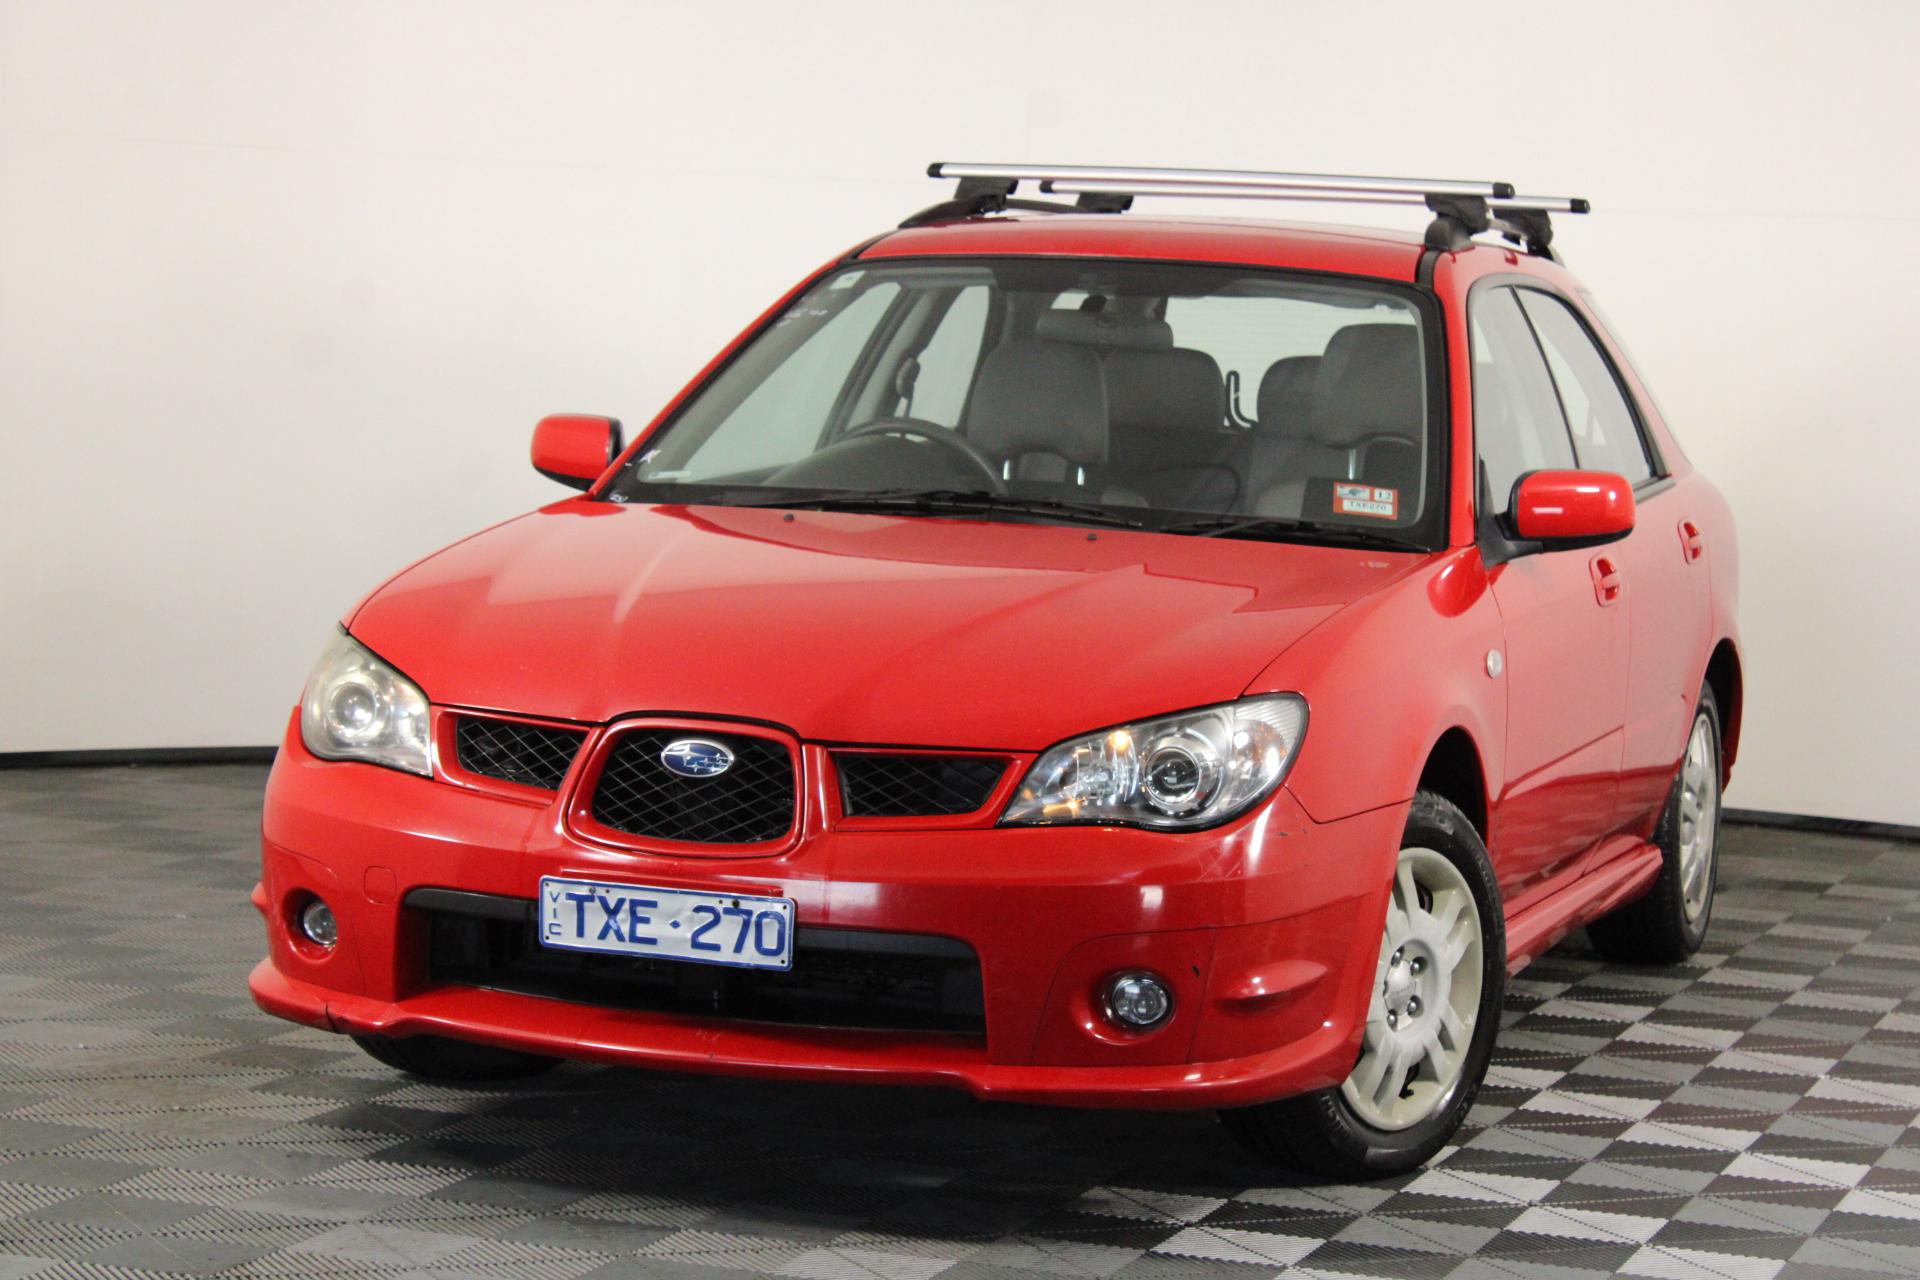 2005 Subaru Impreza 2.0i (AWD) G2 Manual Hatchback